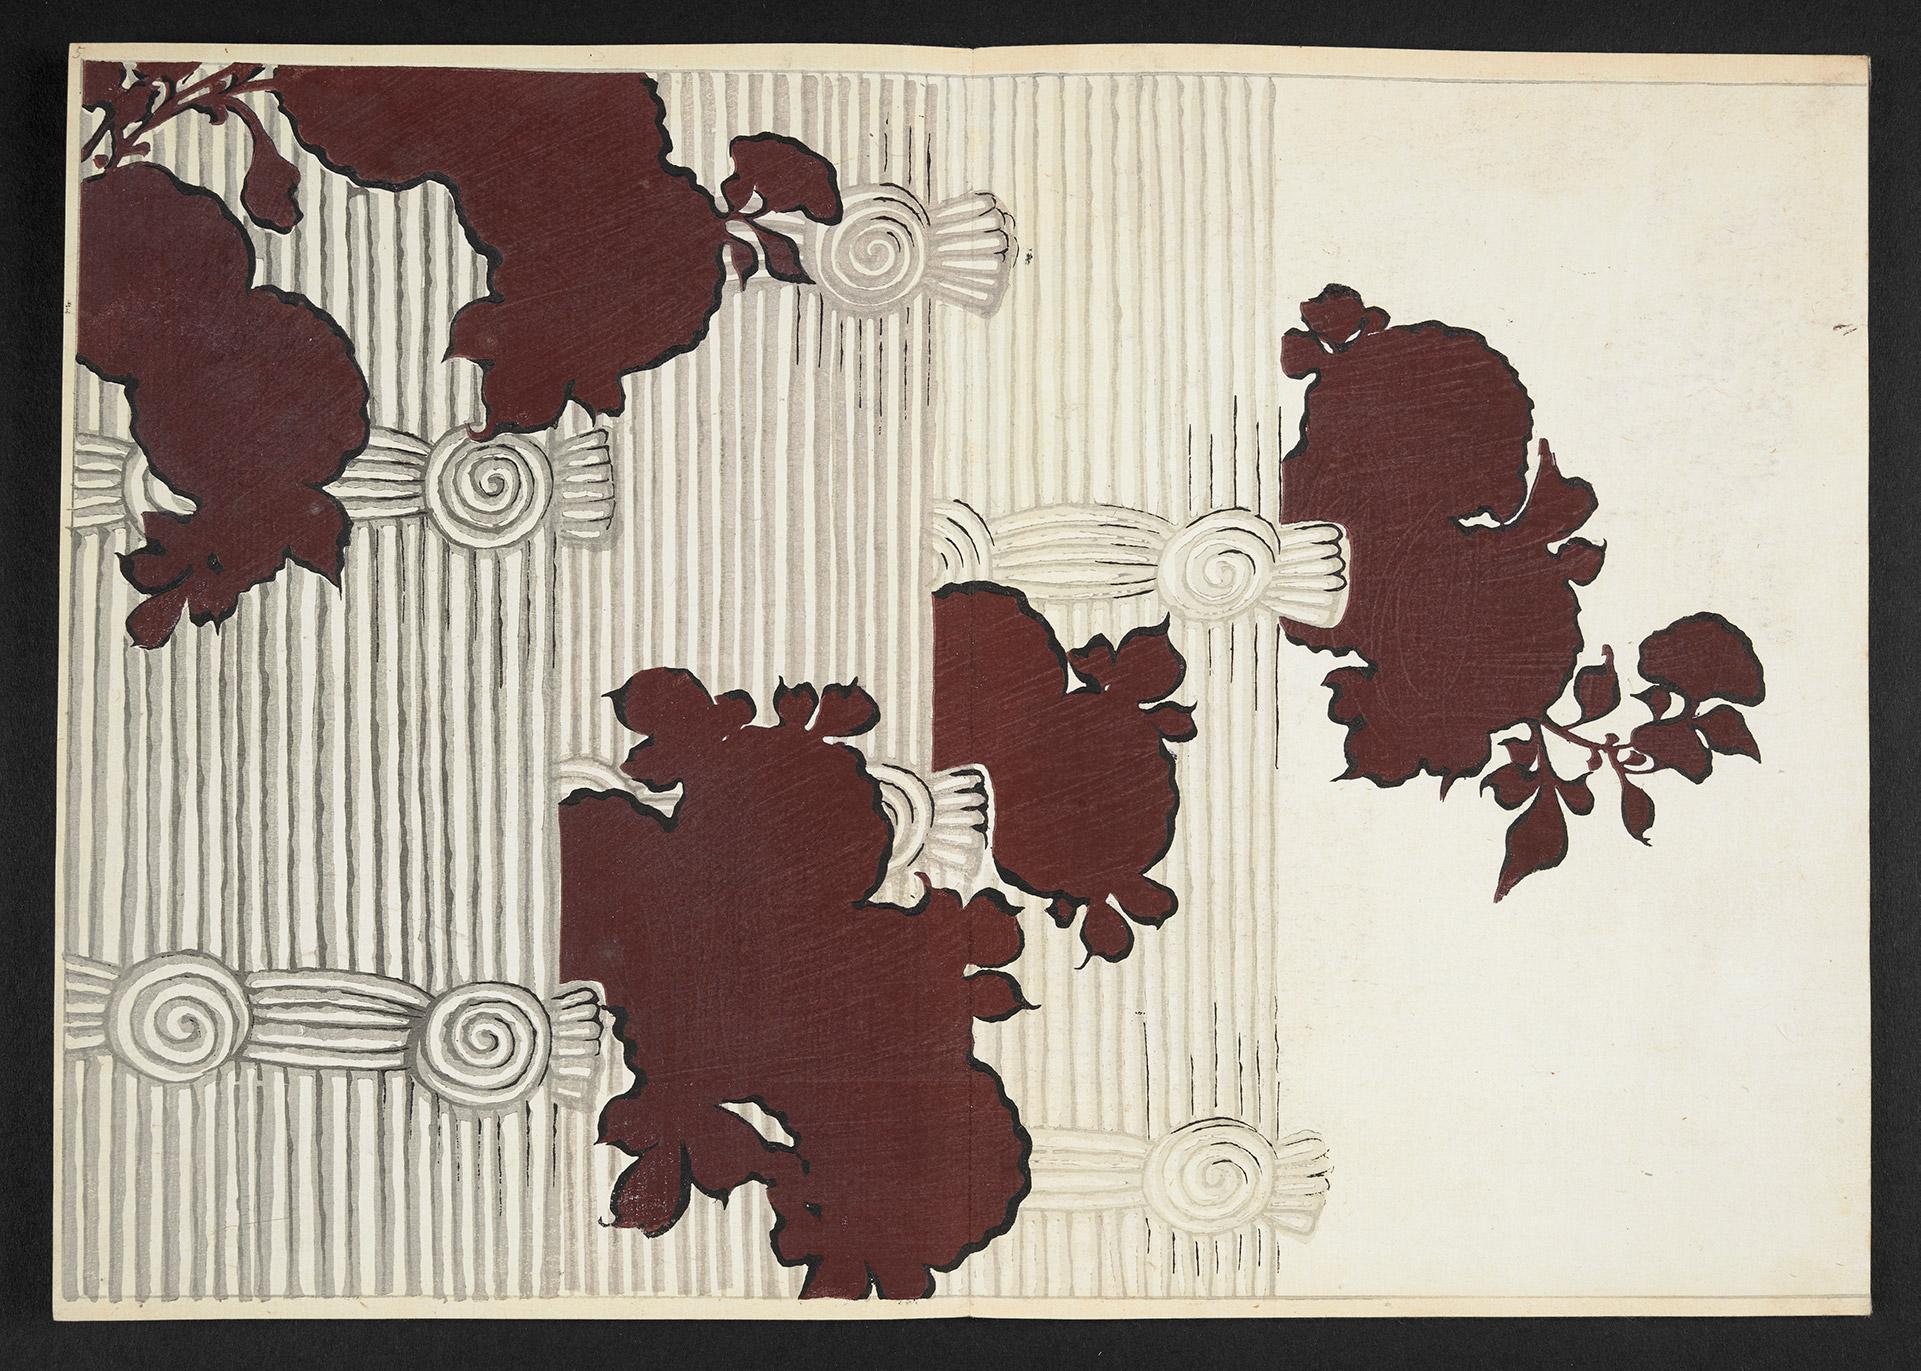 Artwork shaped like leaves